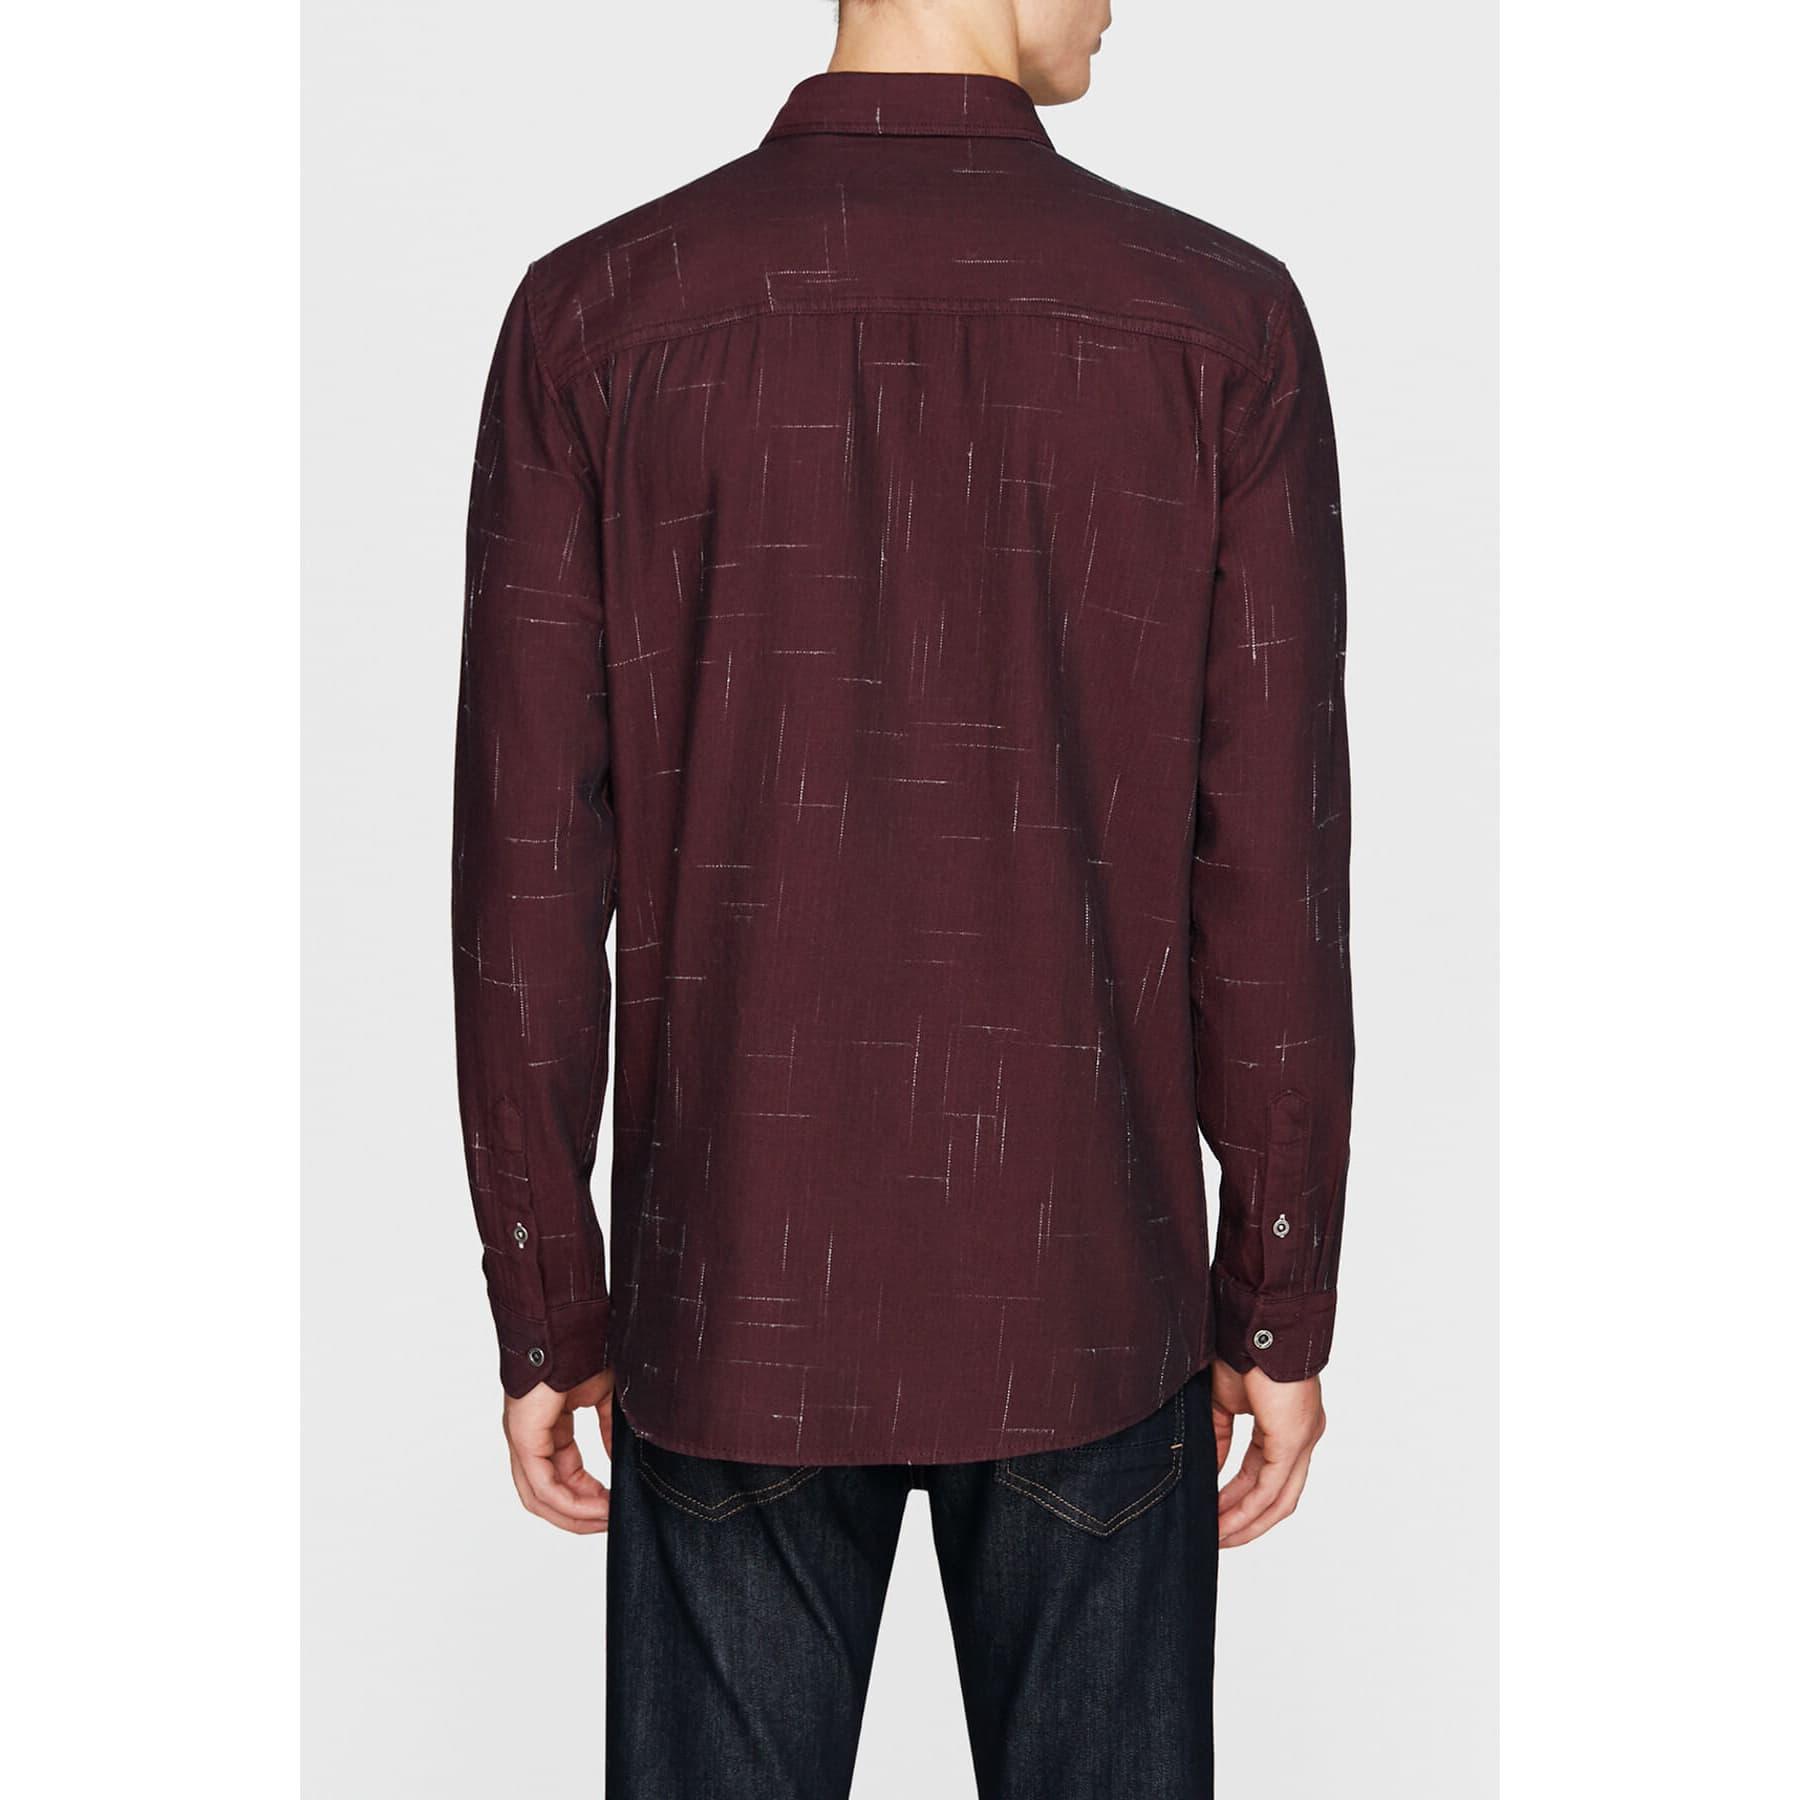 Long Sleeve Shirt Decadent Chocolate